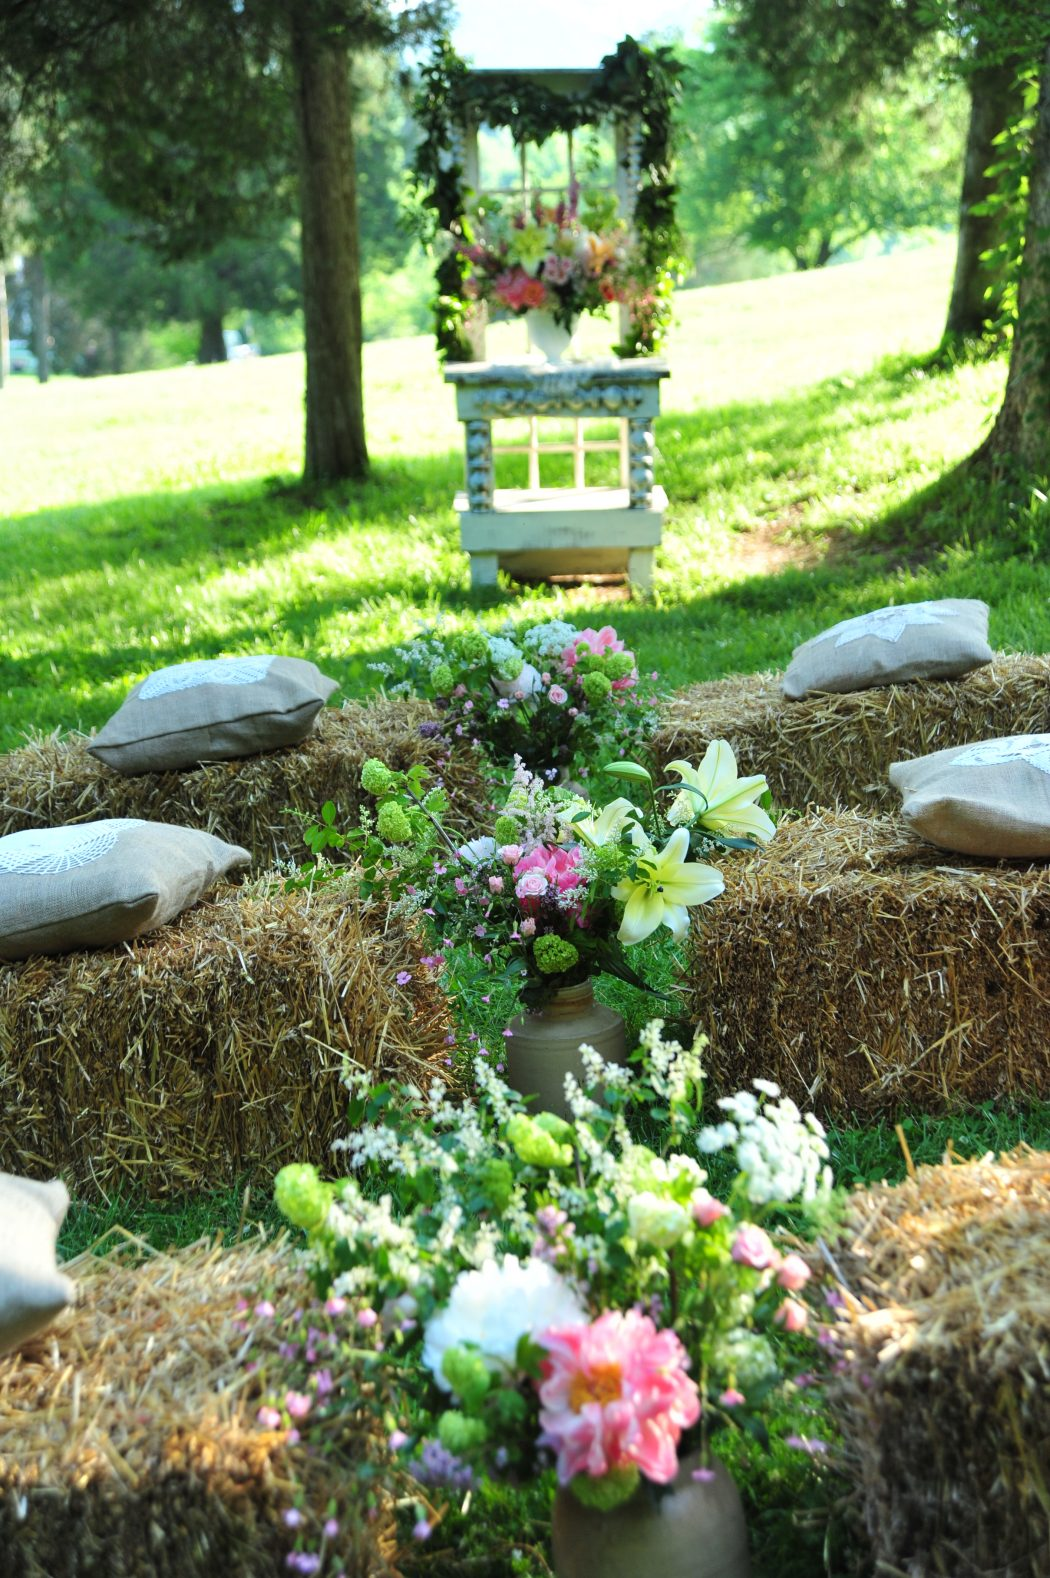 Create-Hay-Grass4 10 Best Outdoor Wedding Ideas in 2017